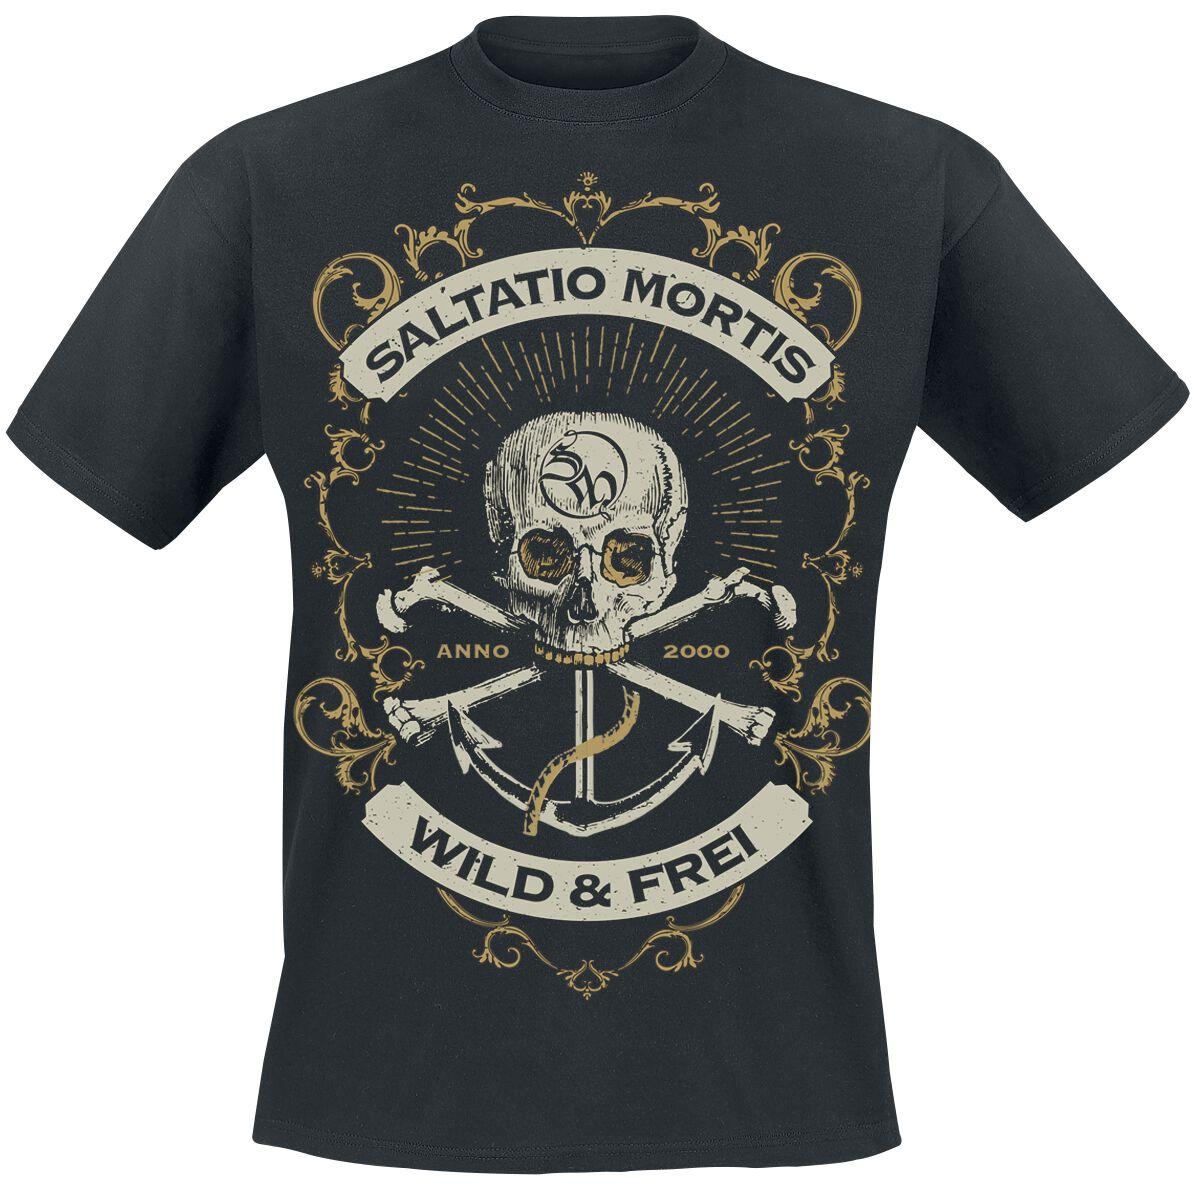 Zespoły - Koszulki - T-Shirt Saltatio Mortis Anchor Skull T-Shirt czarny - 376026